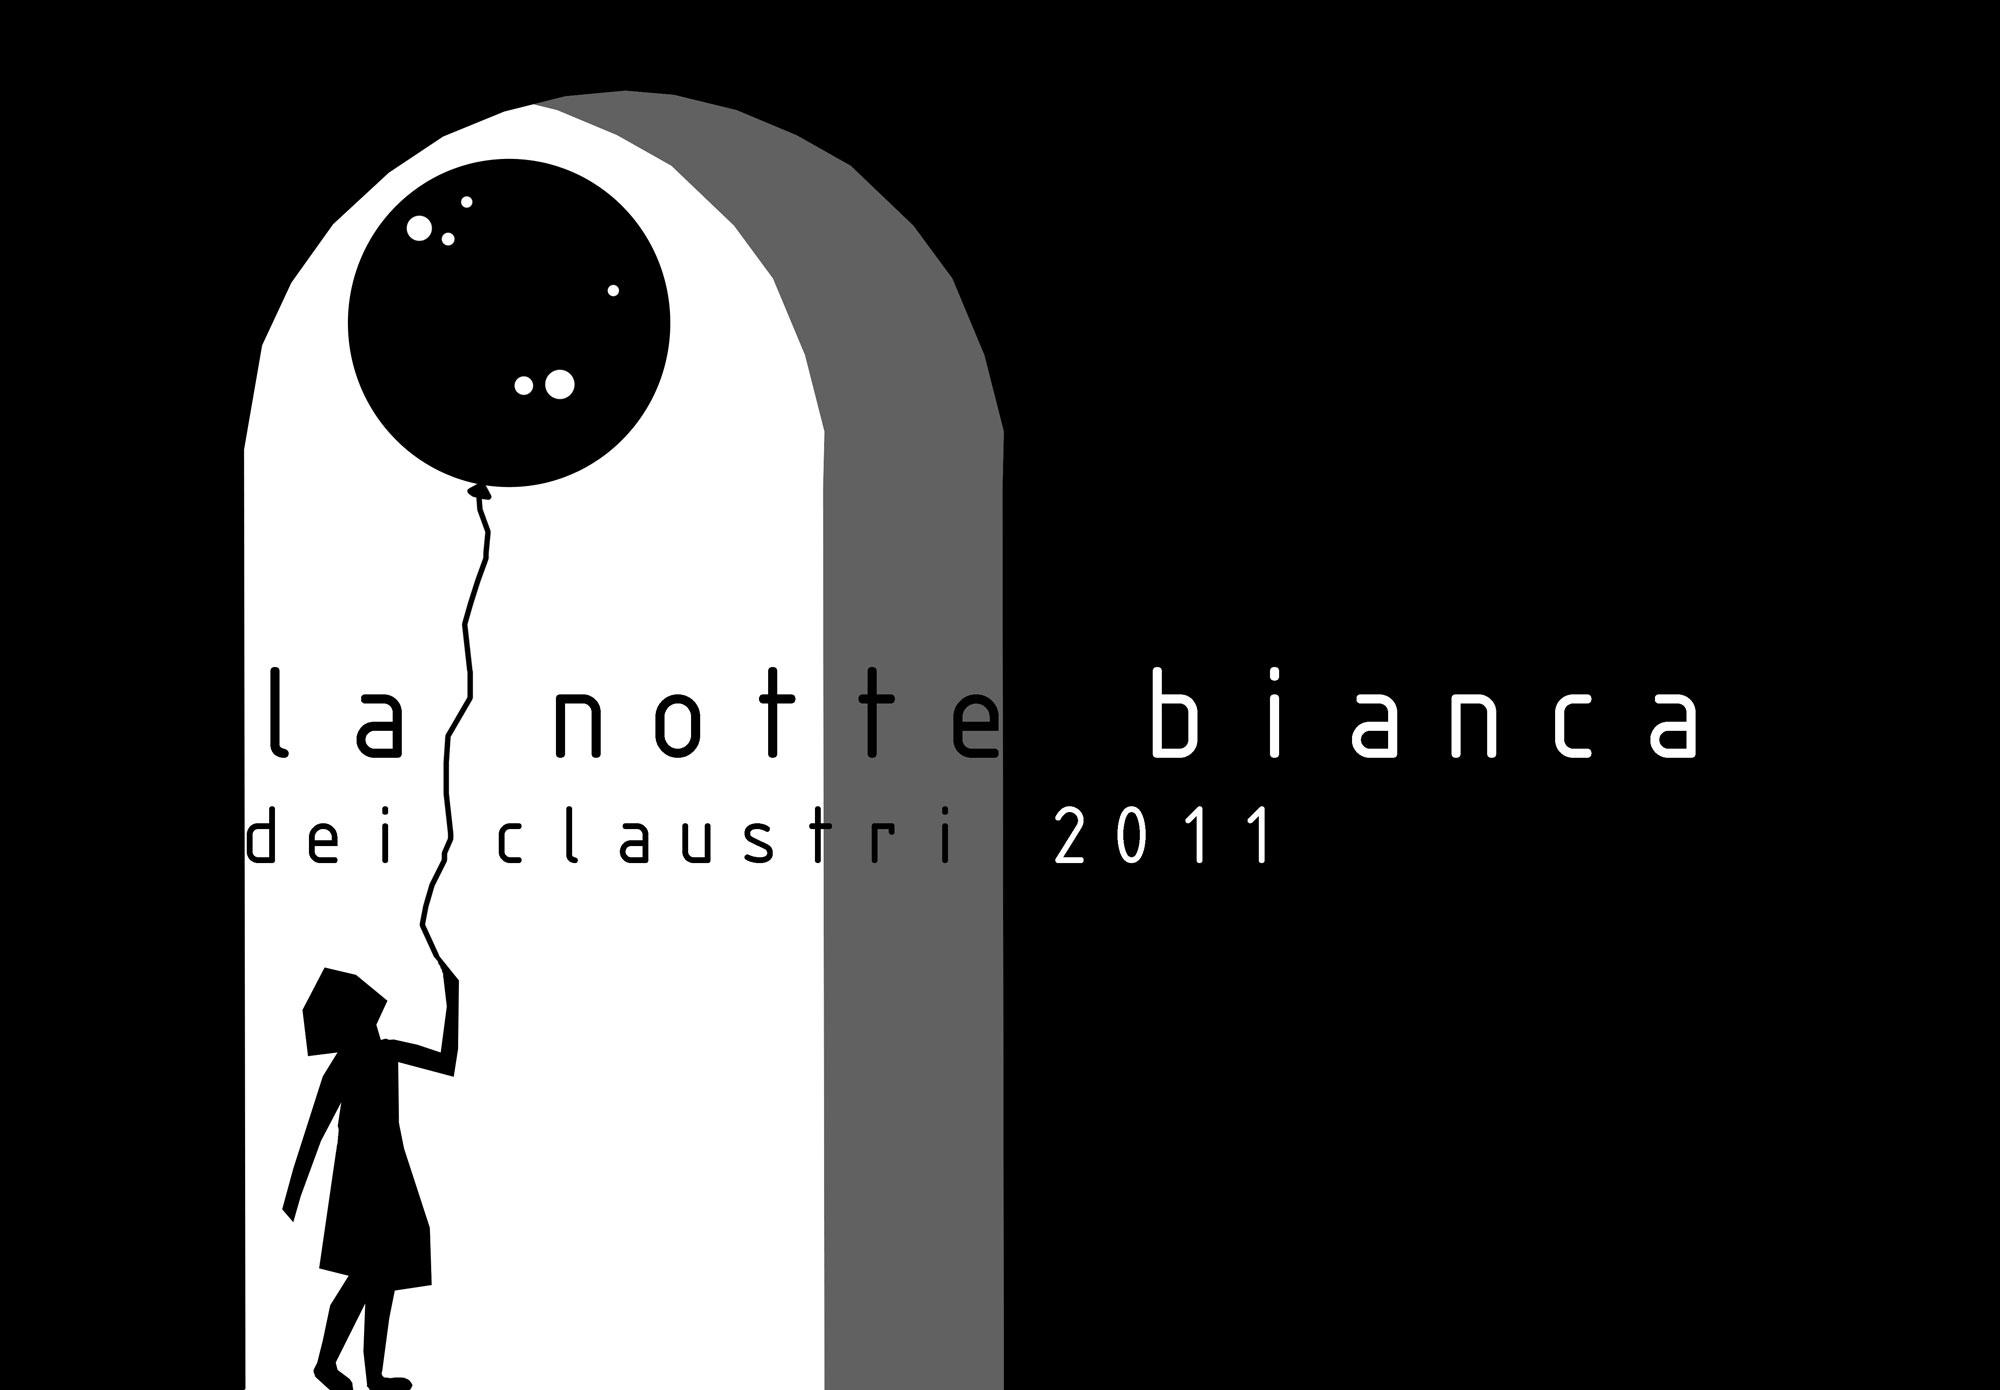 proposta logo notte bianca dei claustri 2011